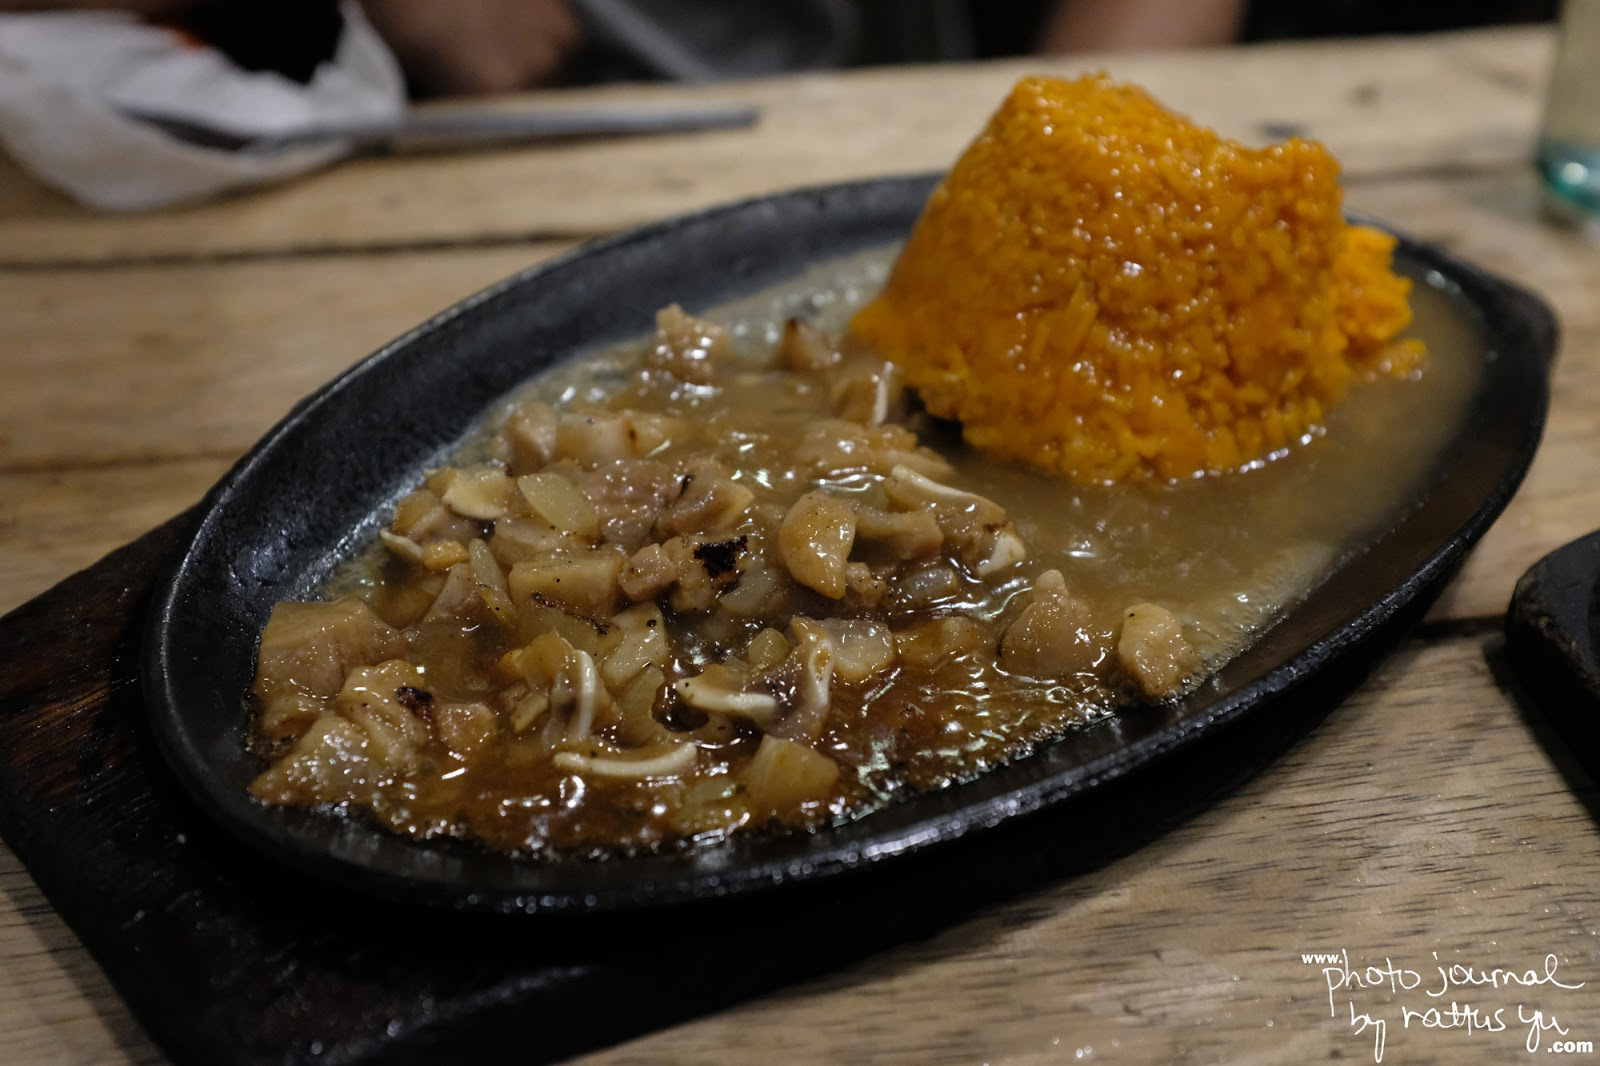 Sizzling Sisig at Egoy's in NS. Amoranto (Retiro) Quezon City